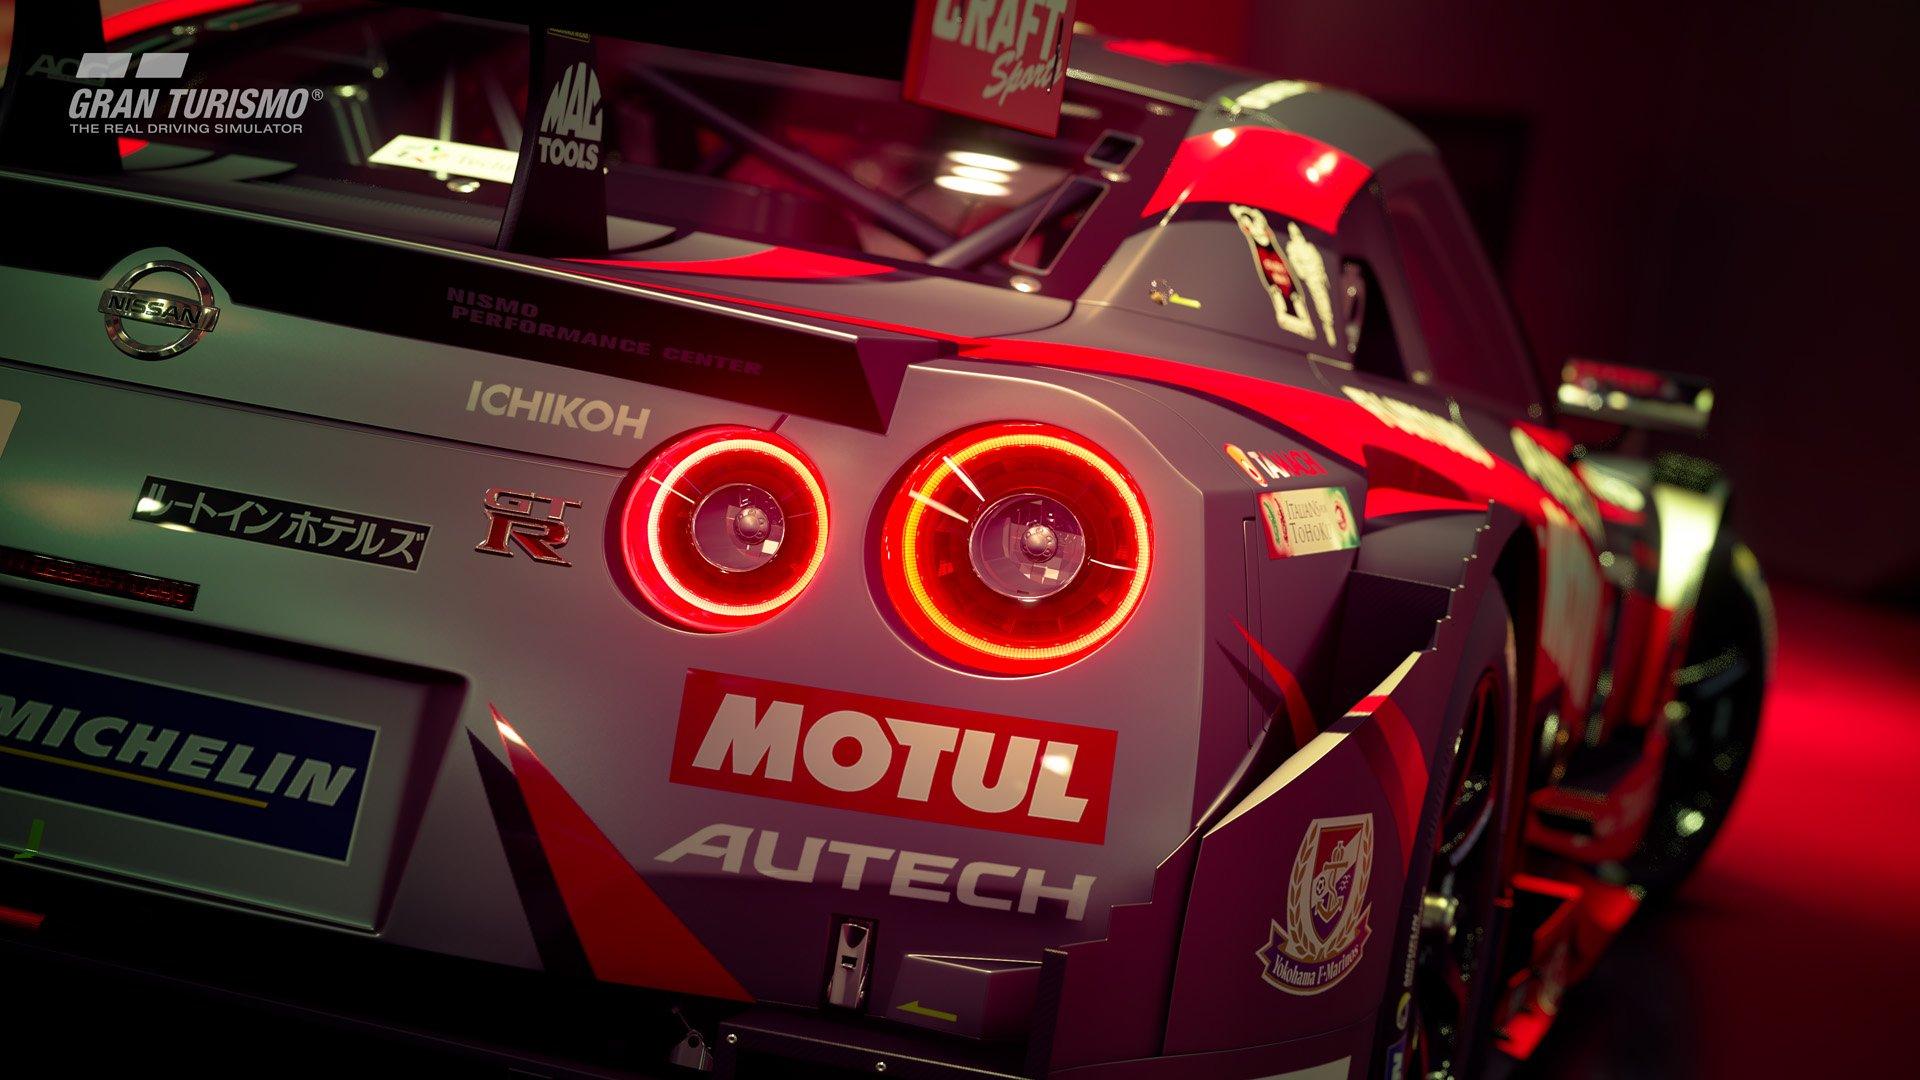 Gran Turismo Patch 115 To Add 13 New Cars Tsukuba